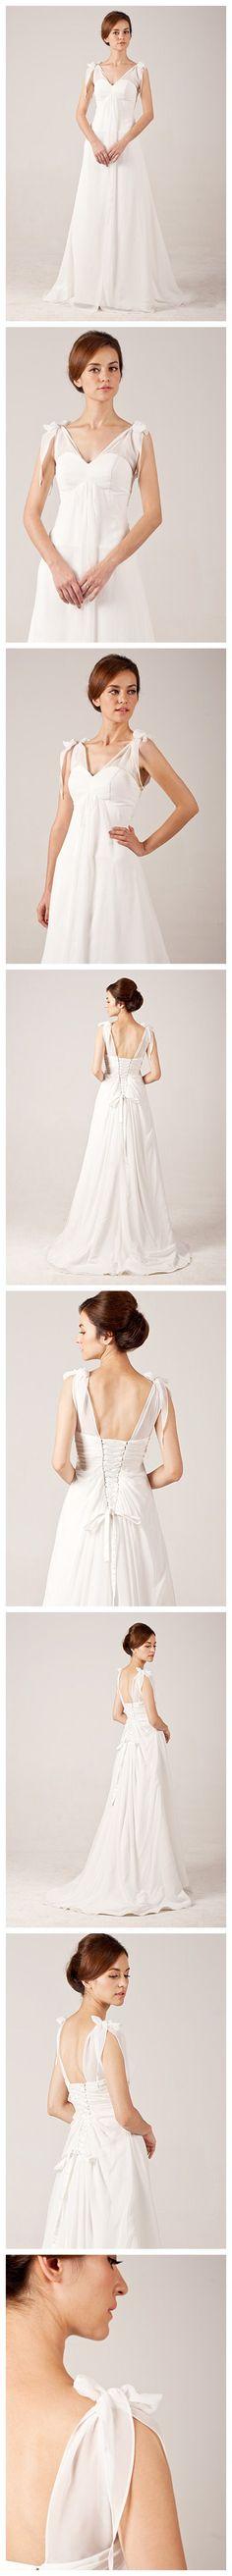 Graceful Simple V-neck Chiffon Wedding Dress with Bows On Shoulder